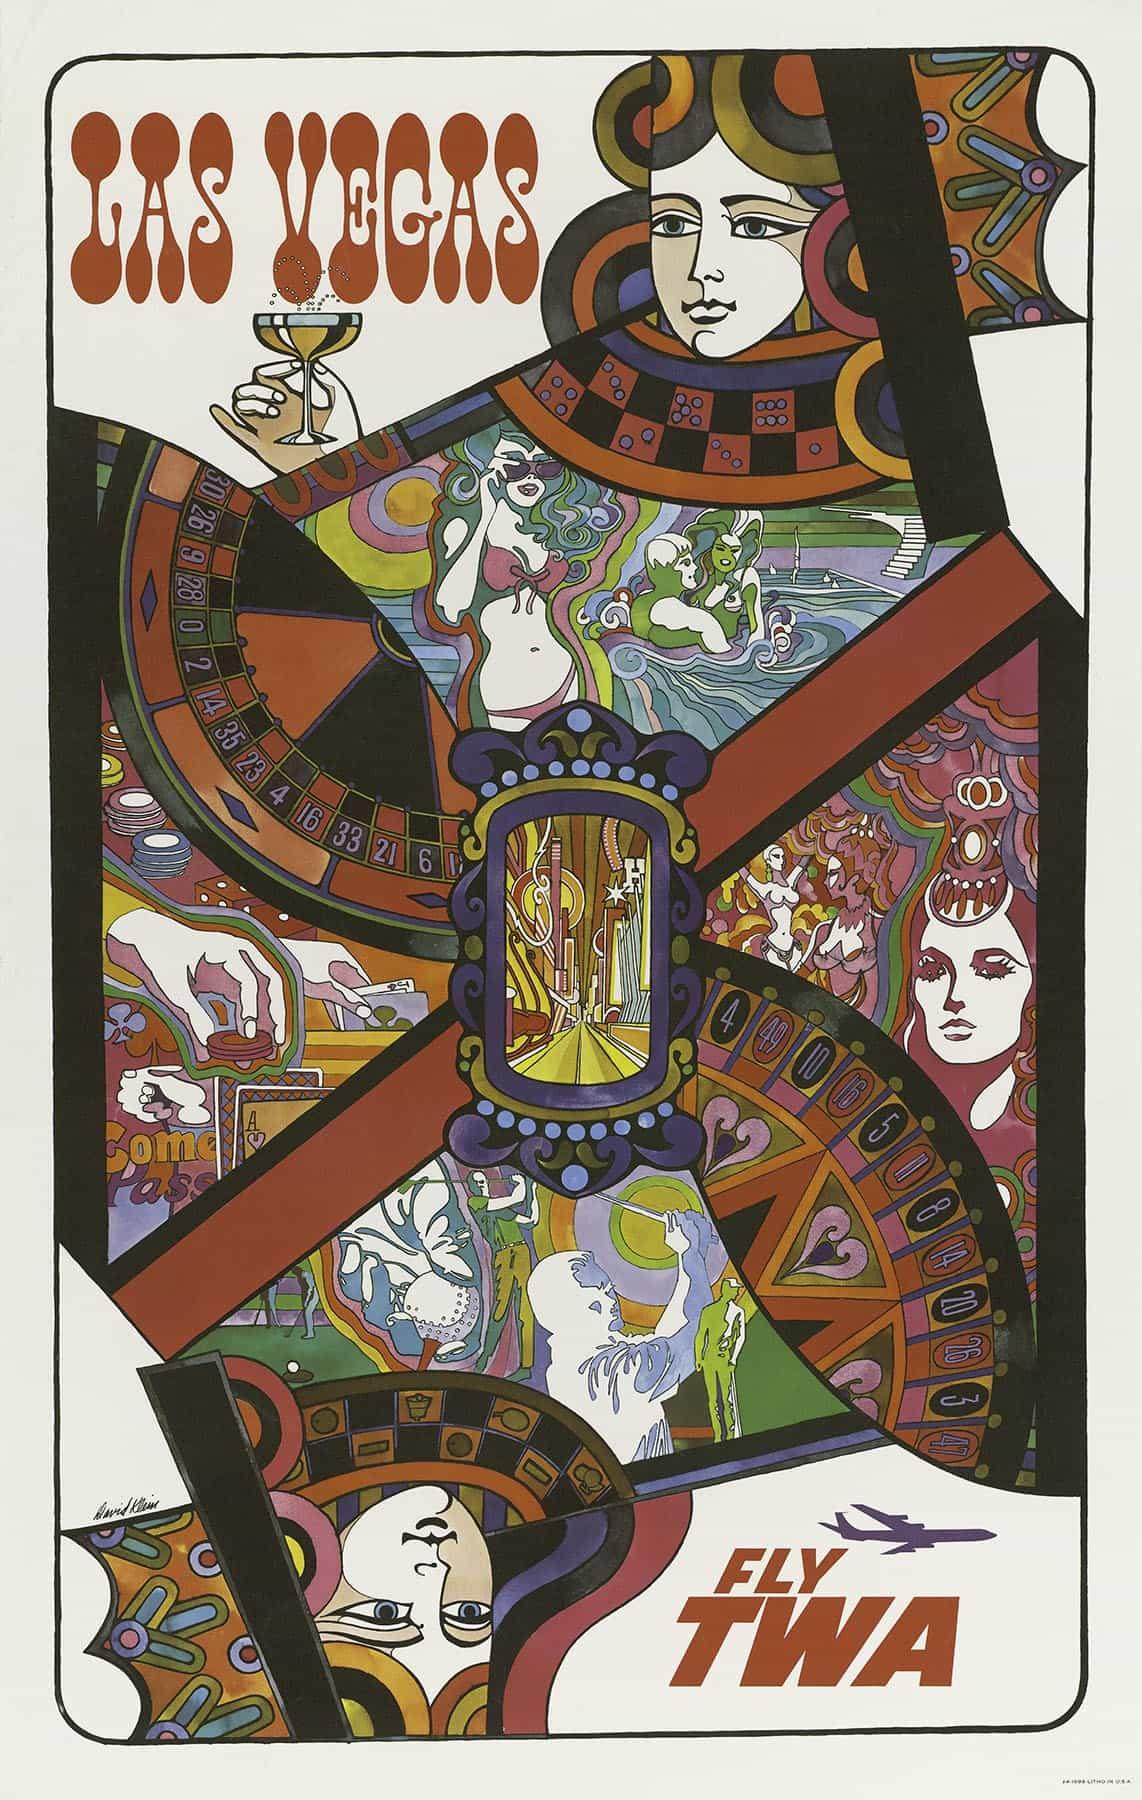 las vegas vintage poster